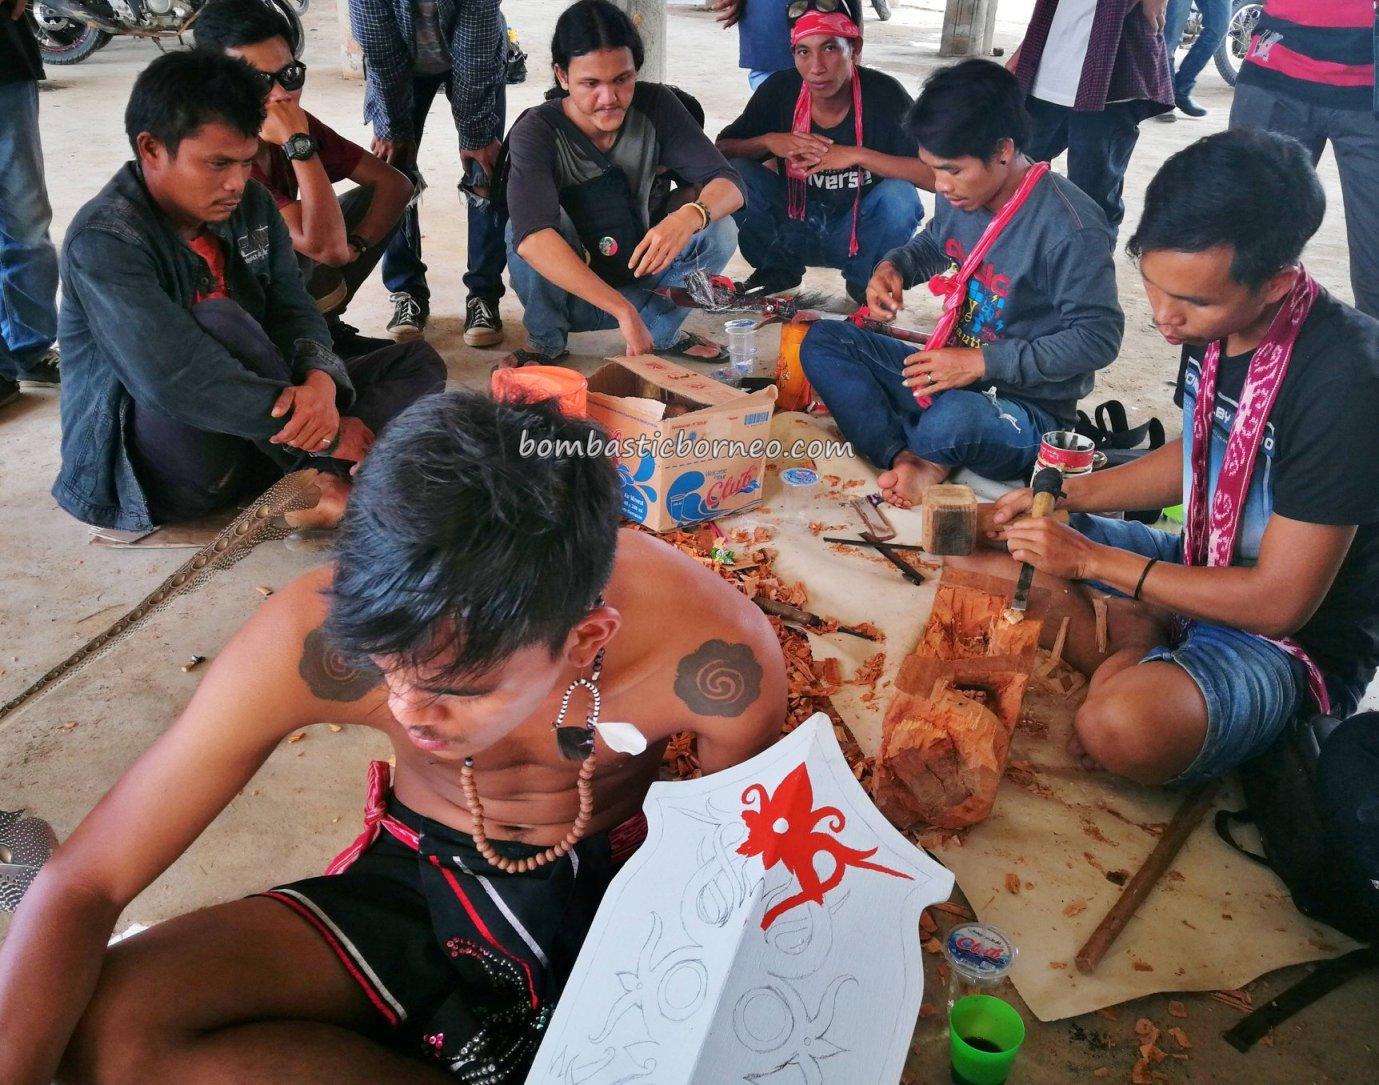 lukisan perisai, ukiran kayu, harvest festival, authentic, traditional, destination, event, Kalimantan Barat, native, tribe, tribal, obyek wisata, tourism, 印尼西加里曼丹, 婆罗洲传统土著文化